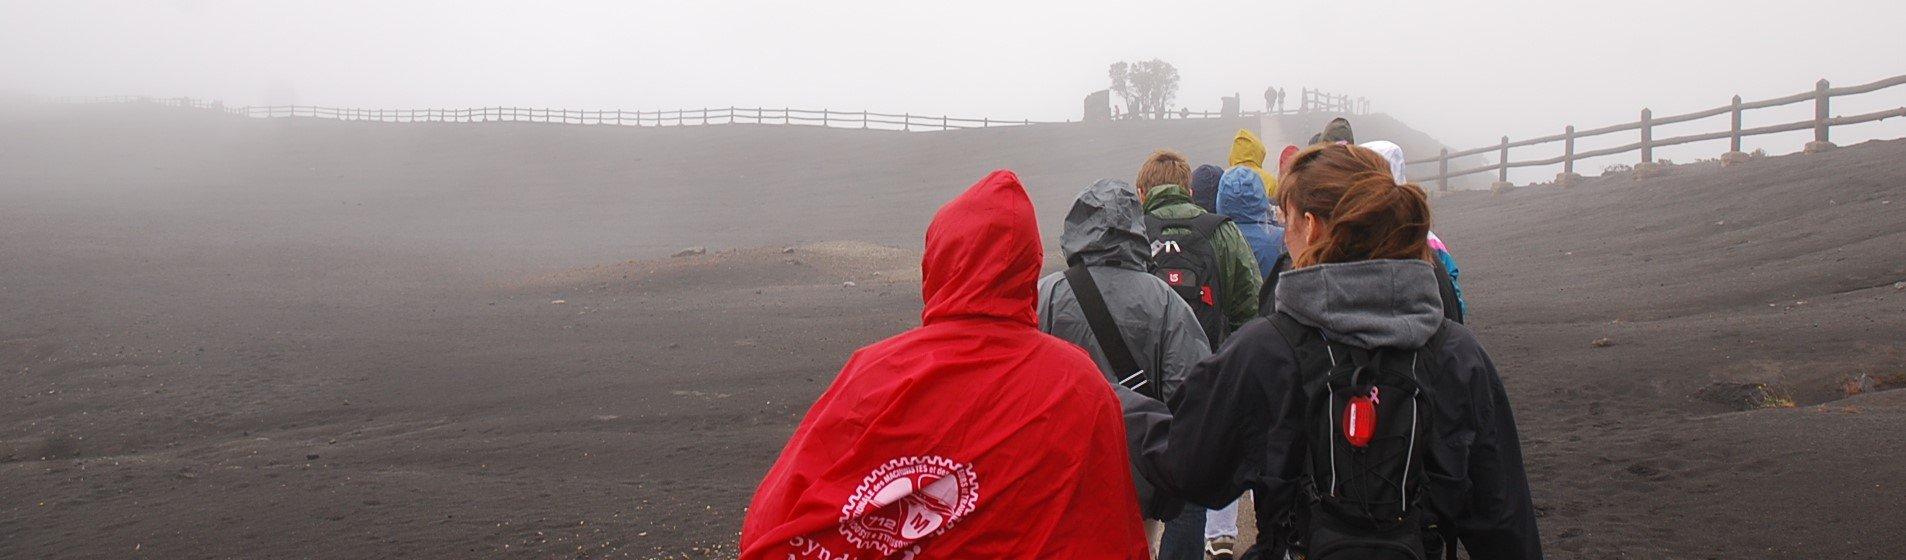 Students exploring a Volcano in Costa Rica